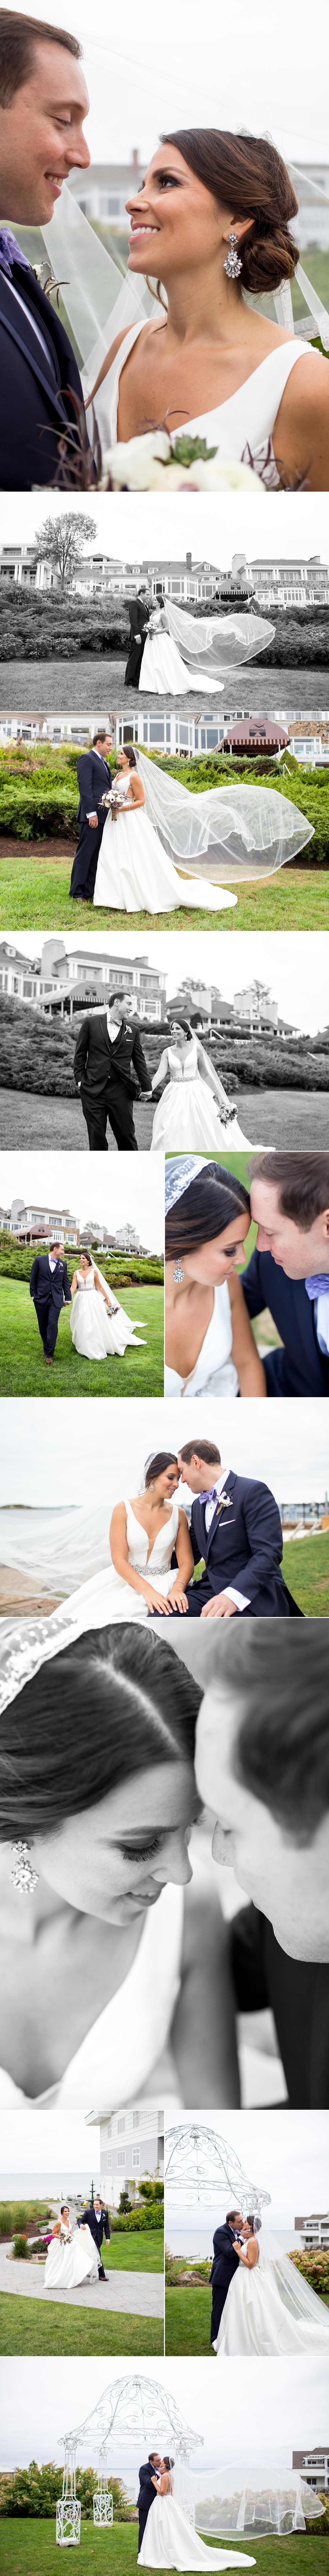 Westbrook, CT Wedding at The Water's Edge Resort & Spa | CT, NYC + Destination Luxury Wedding + Engagement Photographer | Shaina Lee Photography